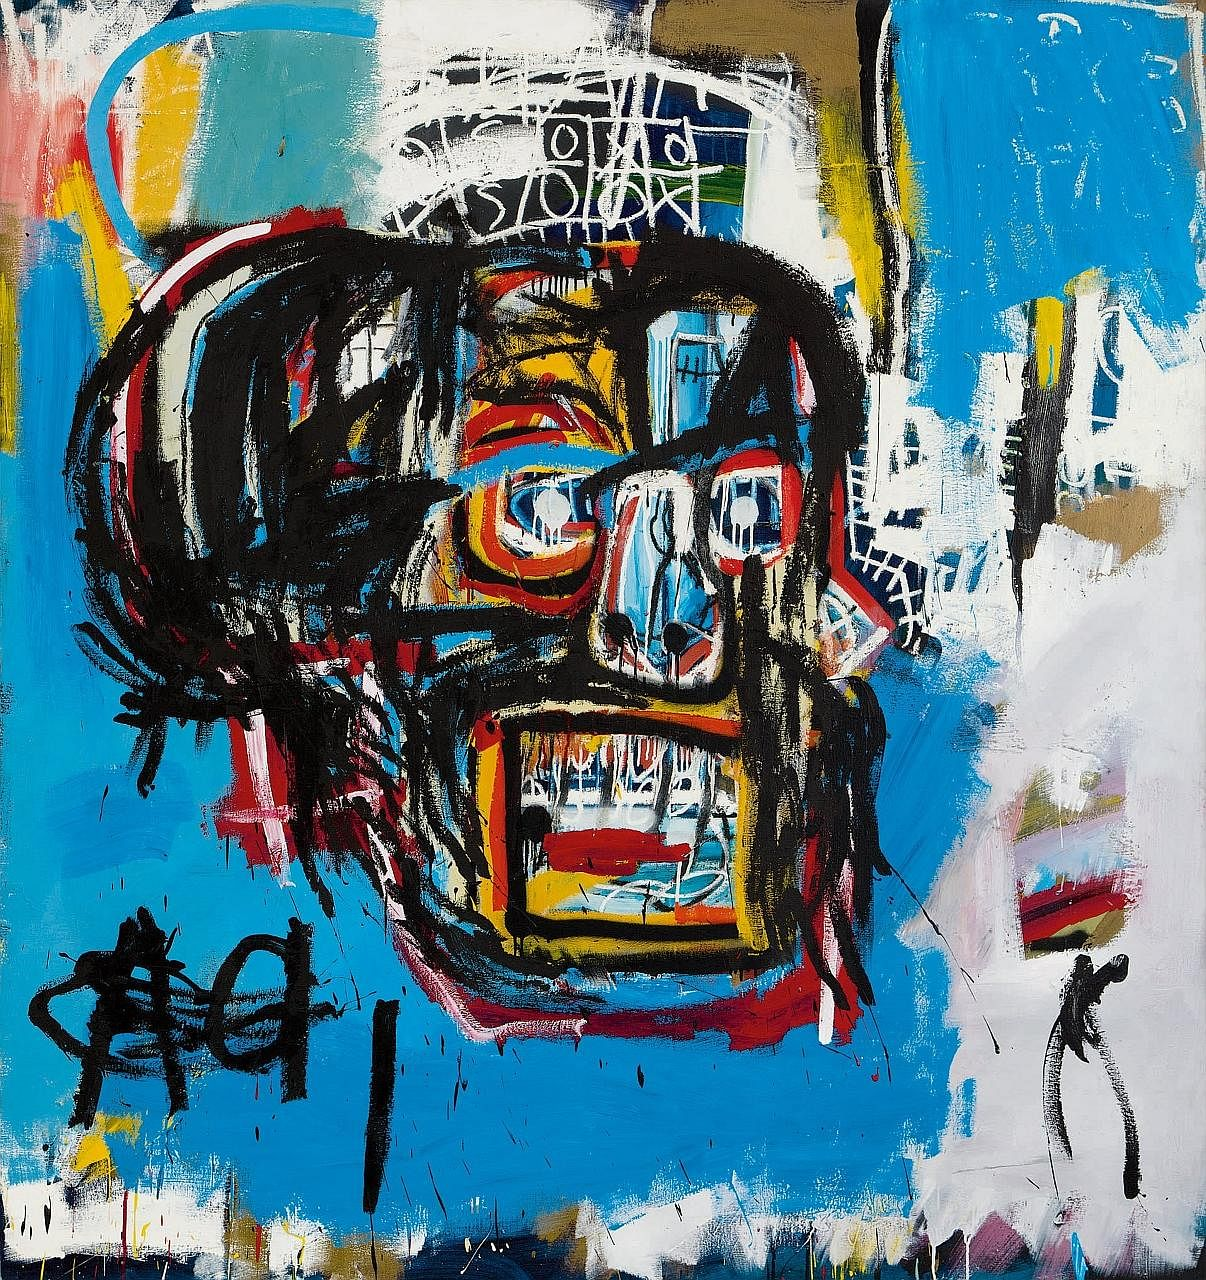 Founder of Japanese online fashion mall Zozotown Yusaku Maezawa bought Jean-Michel Basquiat's 1982 skull painting (above) for US$110.5 million (S$152.6 million).